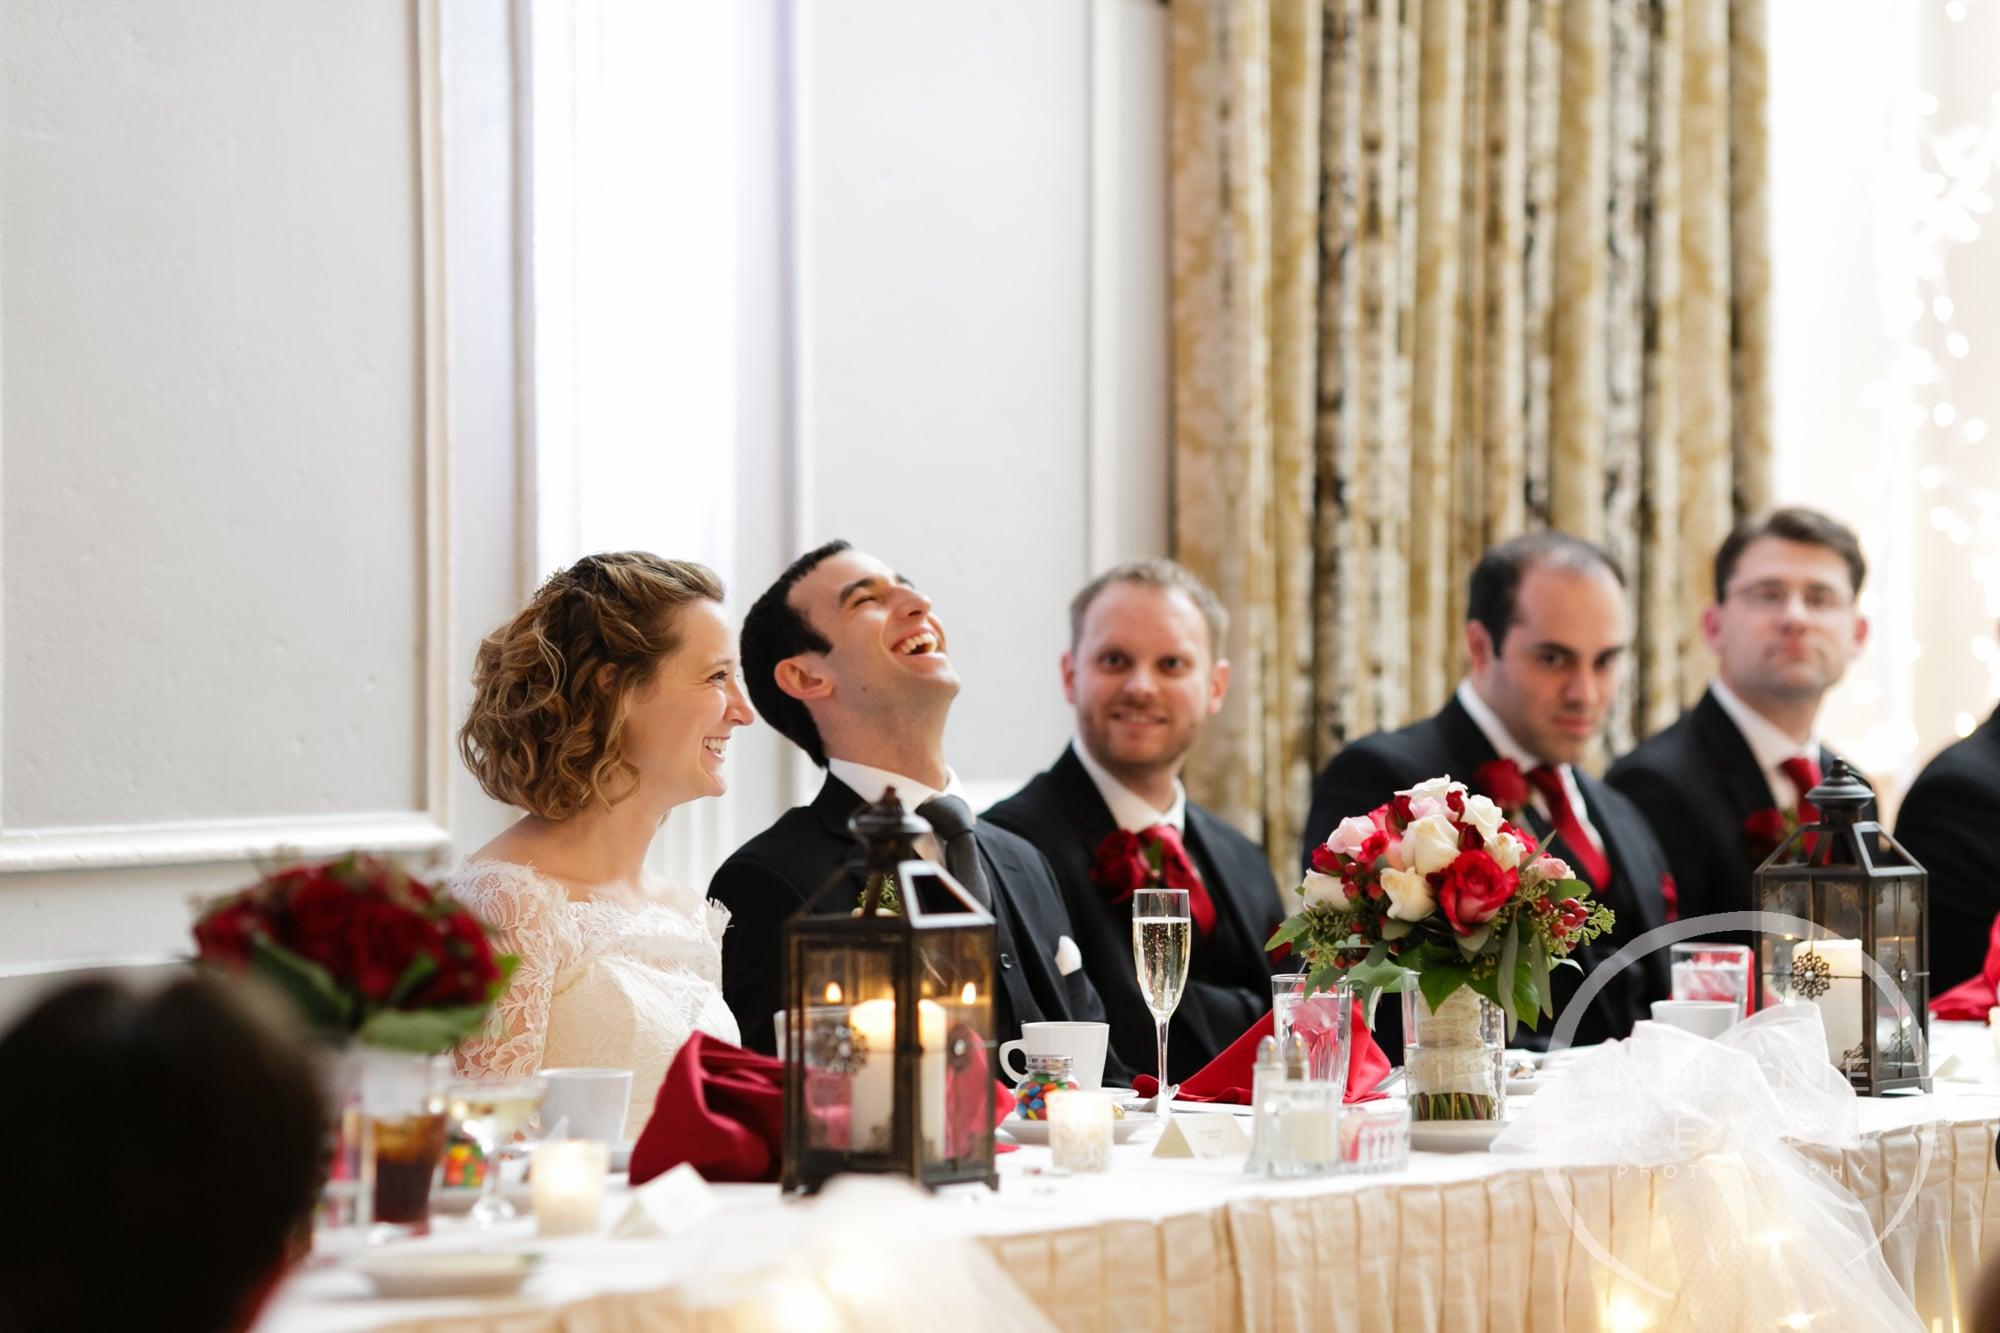 2015_ann_arbor_wedding_photographer_melaniereyes_049.JPG